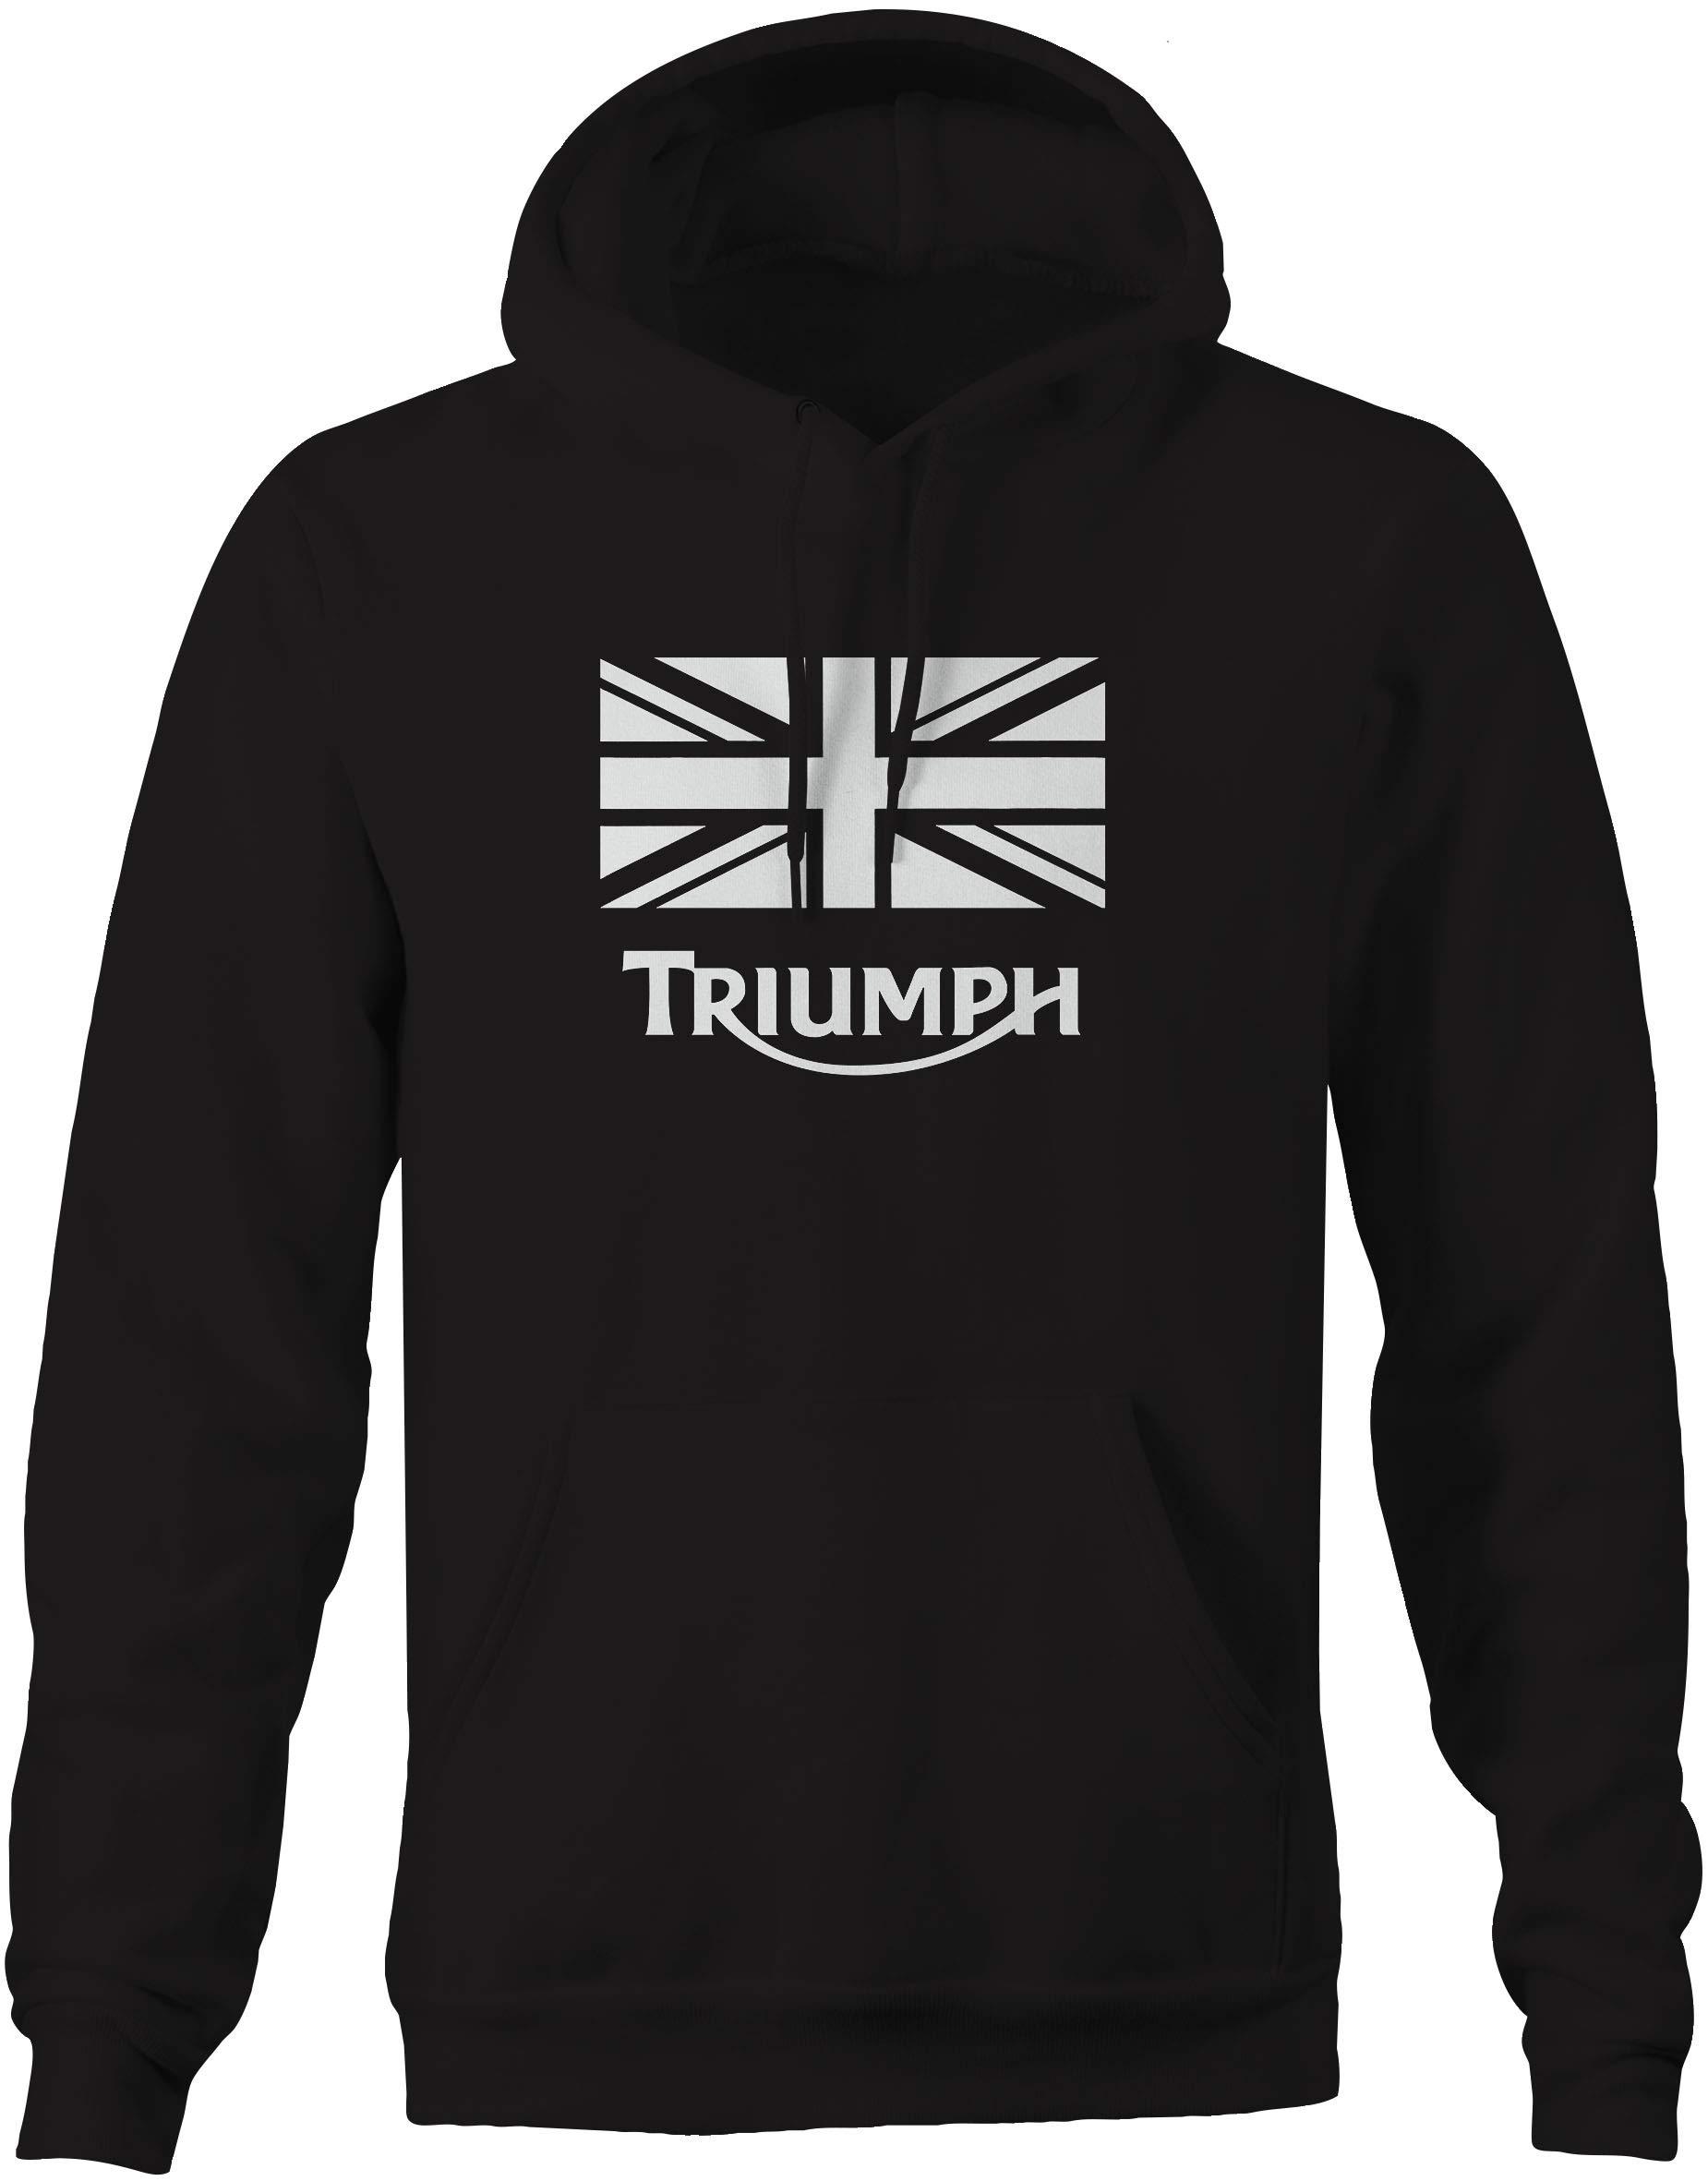 Triumph Vintage Motorcycle Logo'd Black Hooded Sweatshirt - 3XL